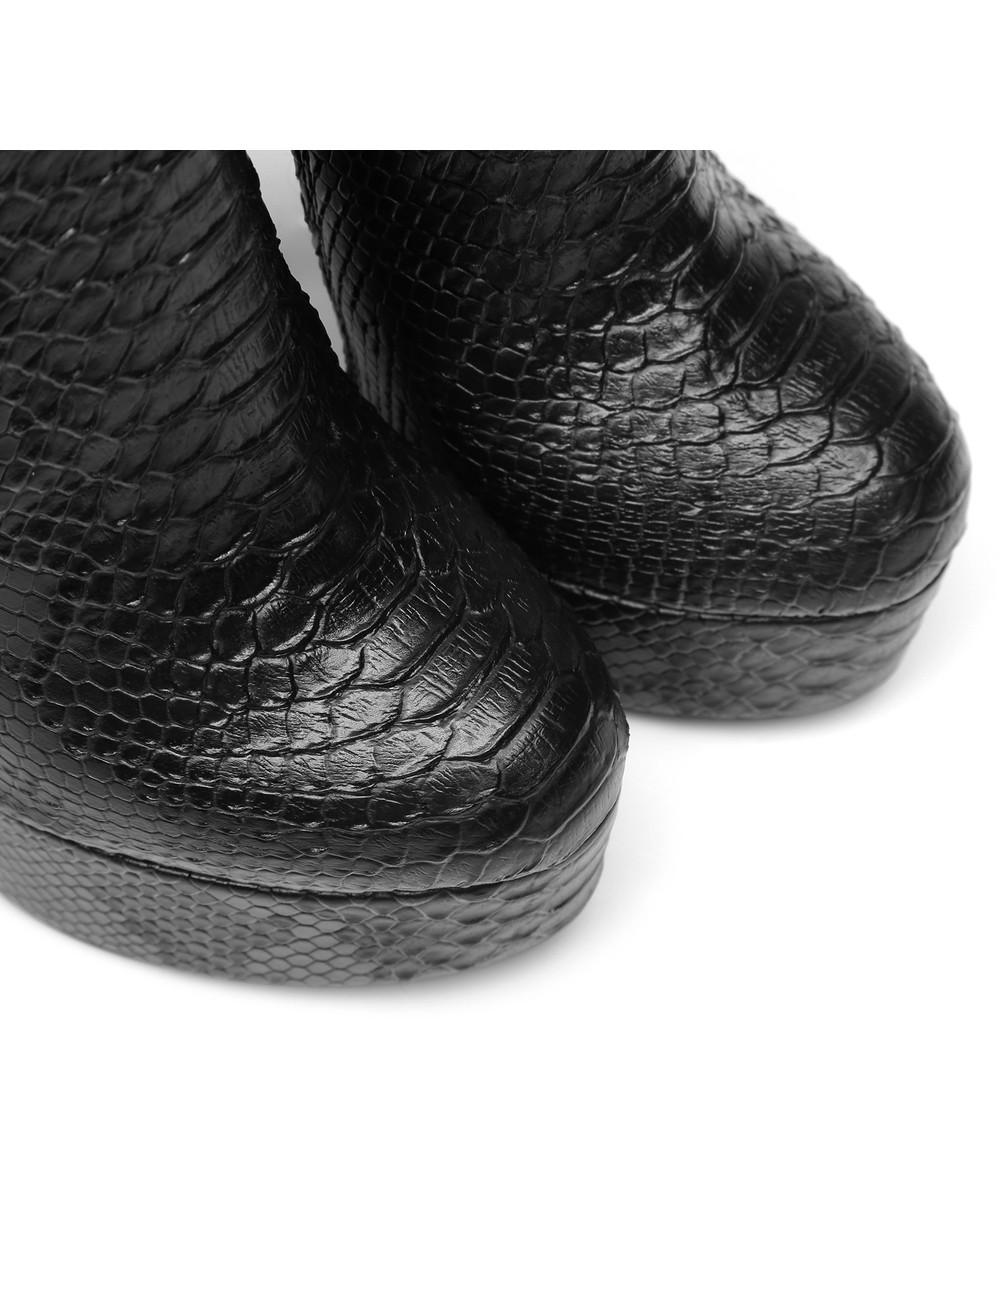 "Giaro Black Snake Giaro ""Galana"" enkellaarsjes"